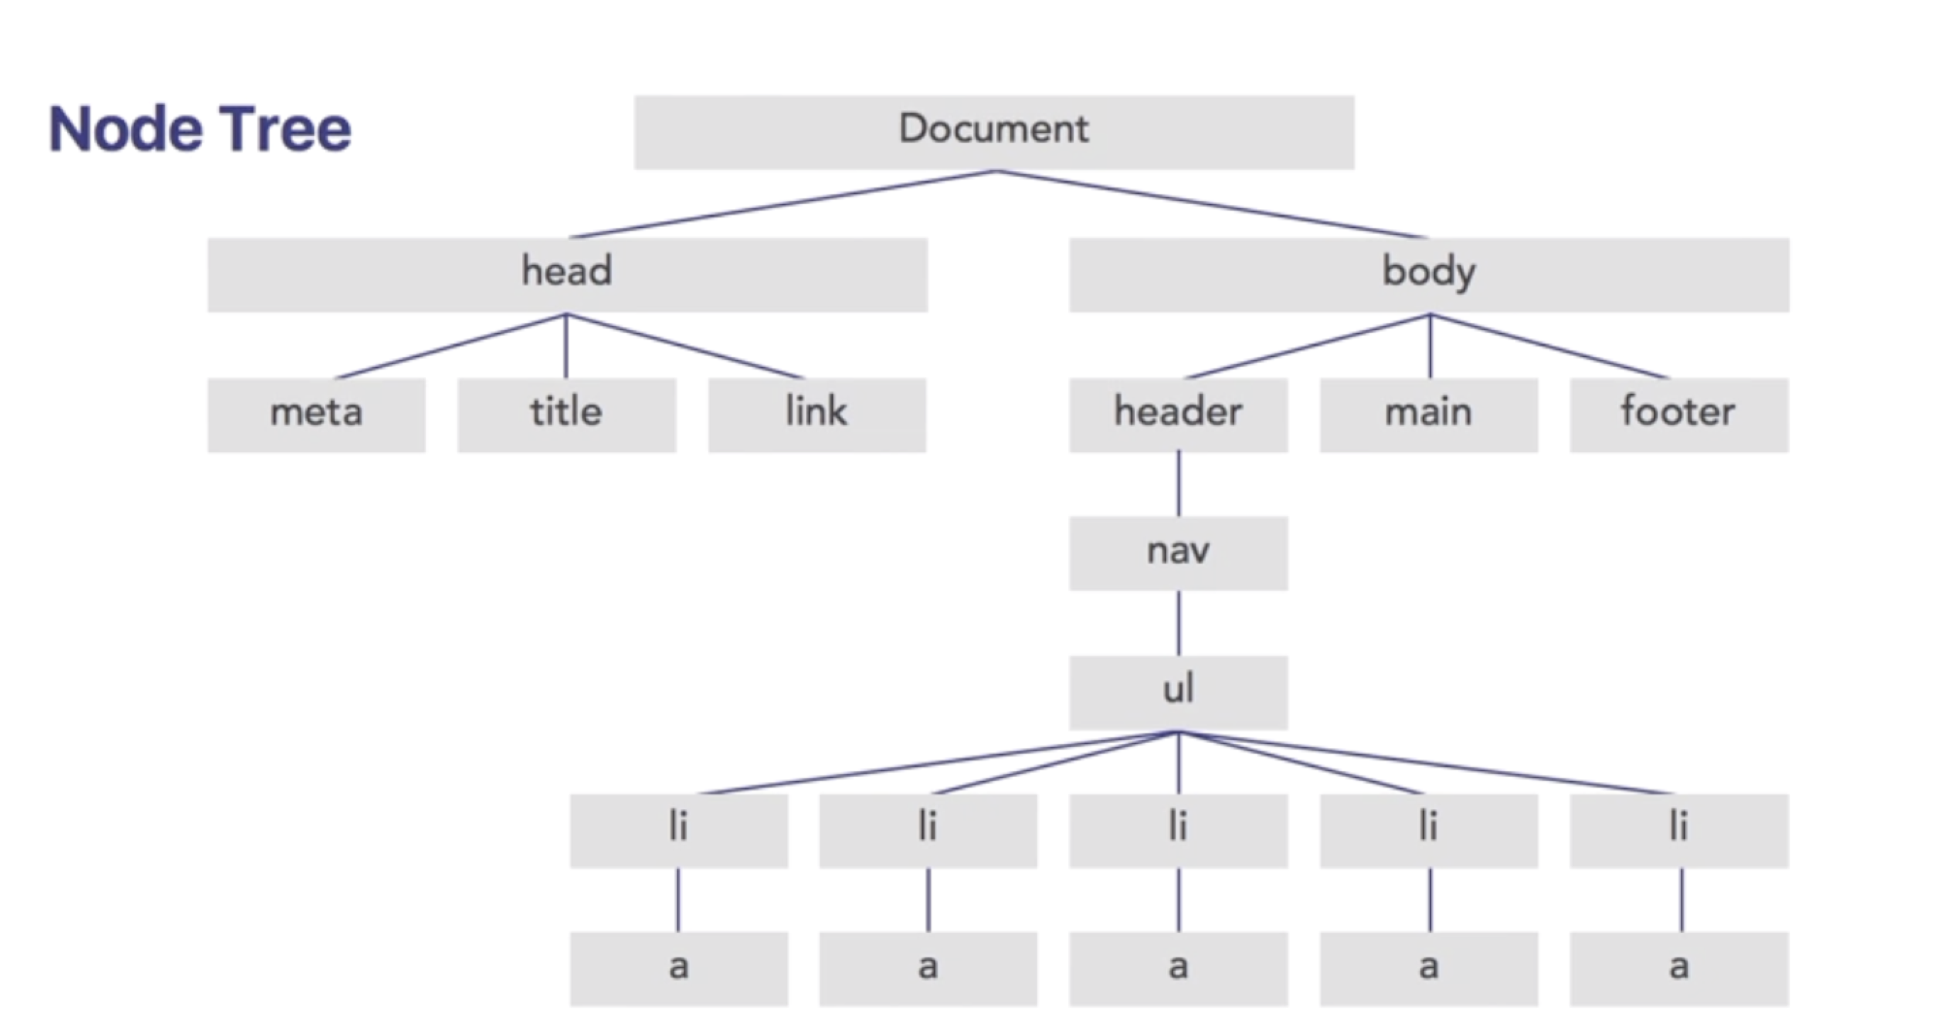 node_tree